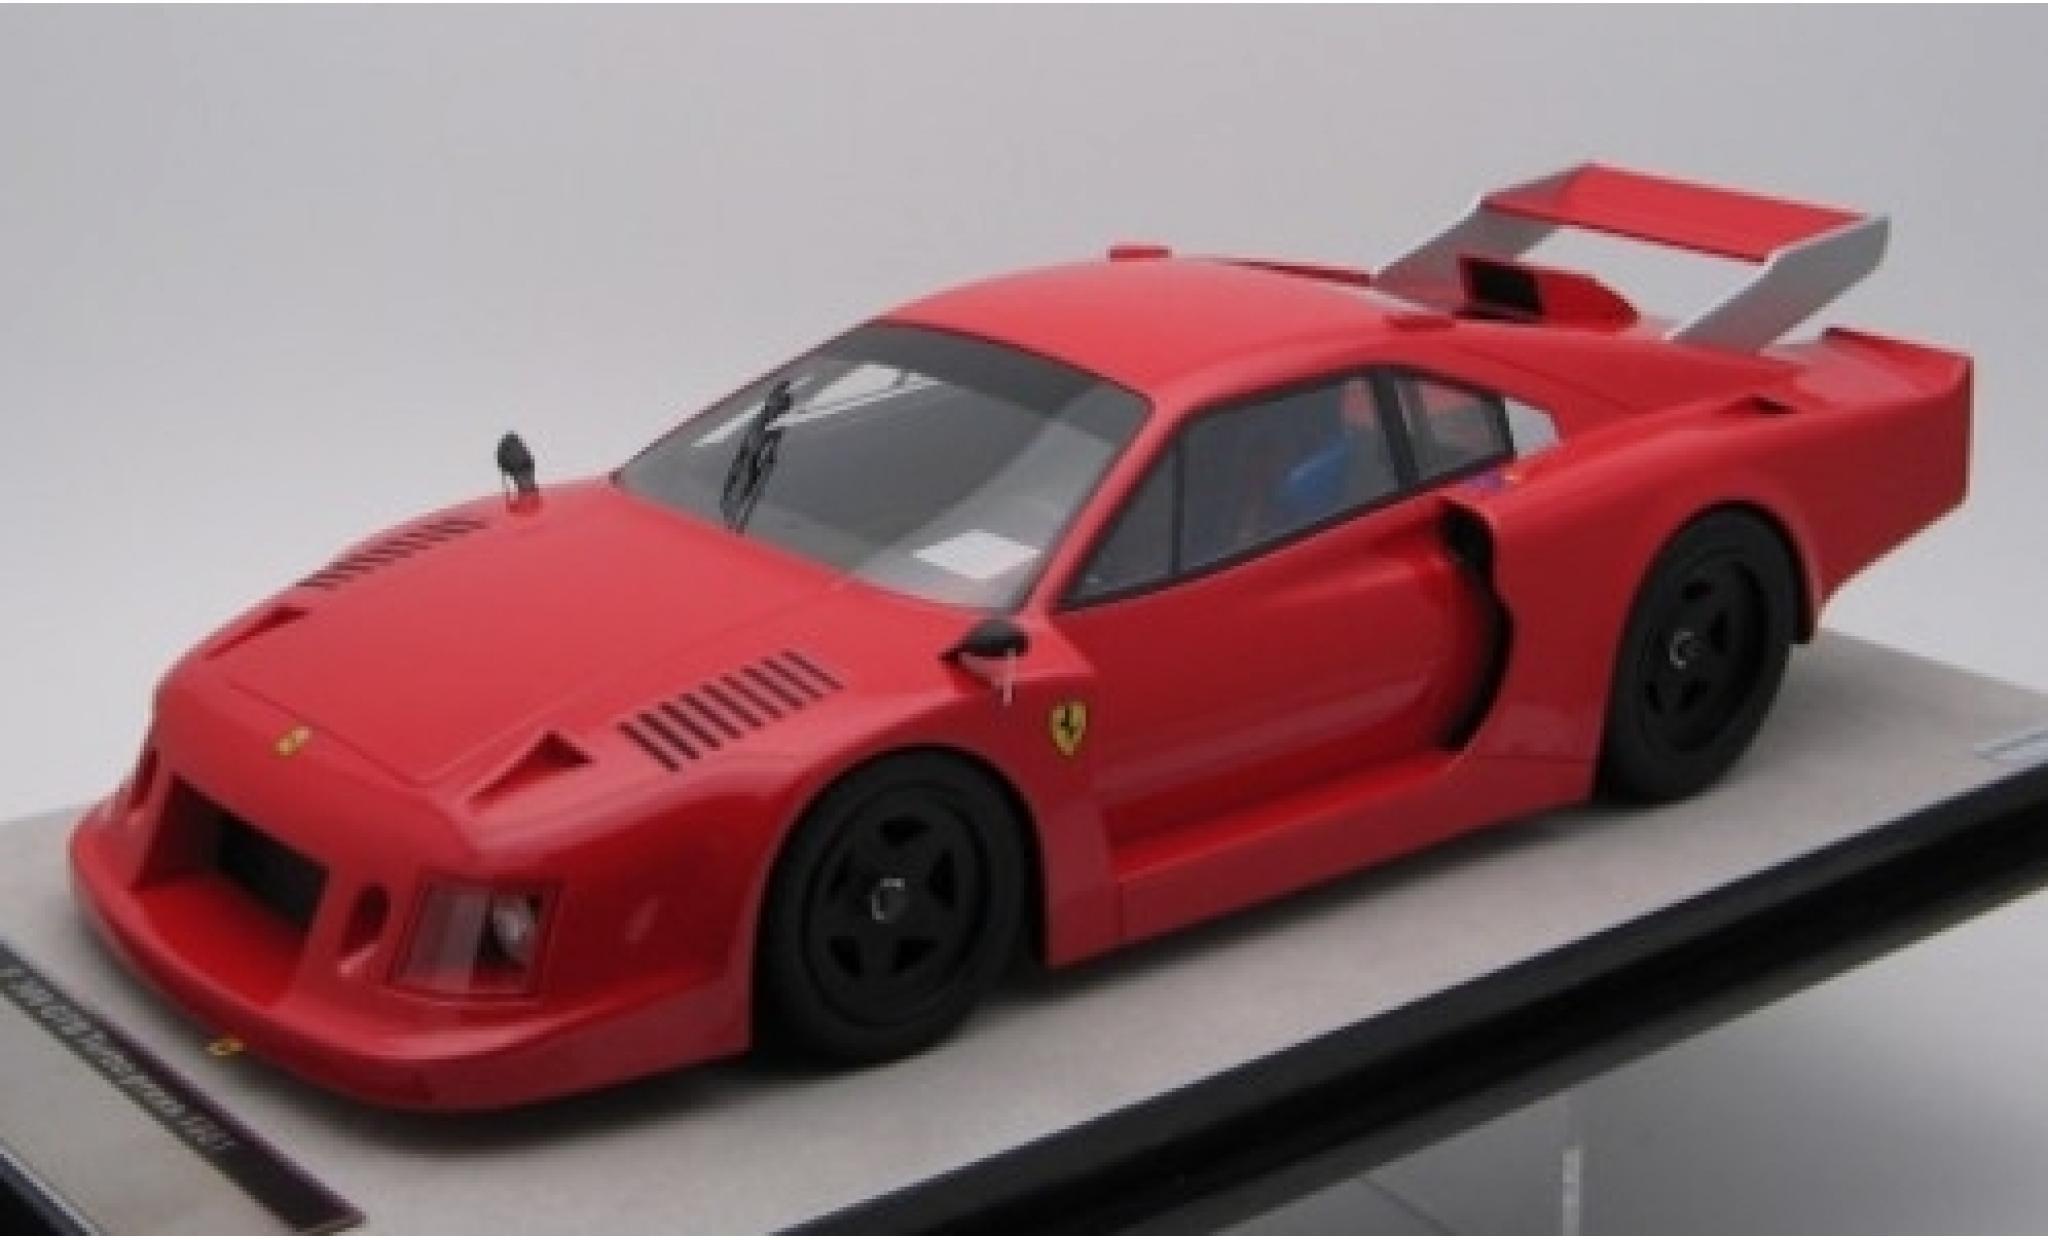 Ferrari 308 1/18 Tecnomodel GTB Turbo red Scuderia 1981 Presse- et v�hicule de test